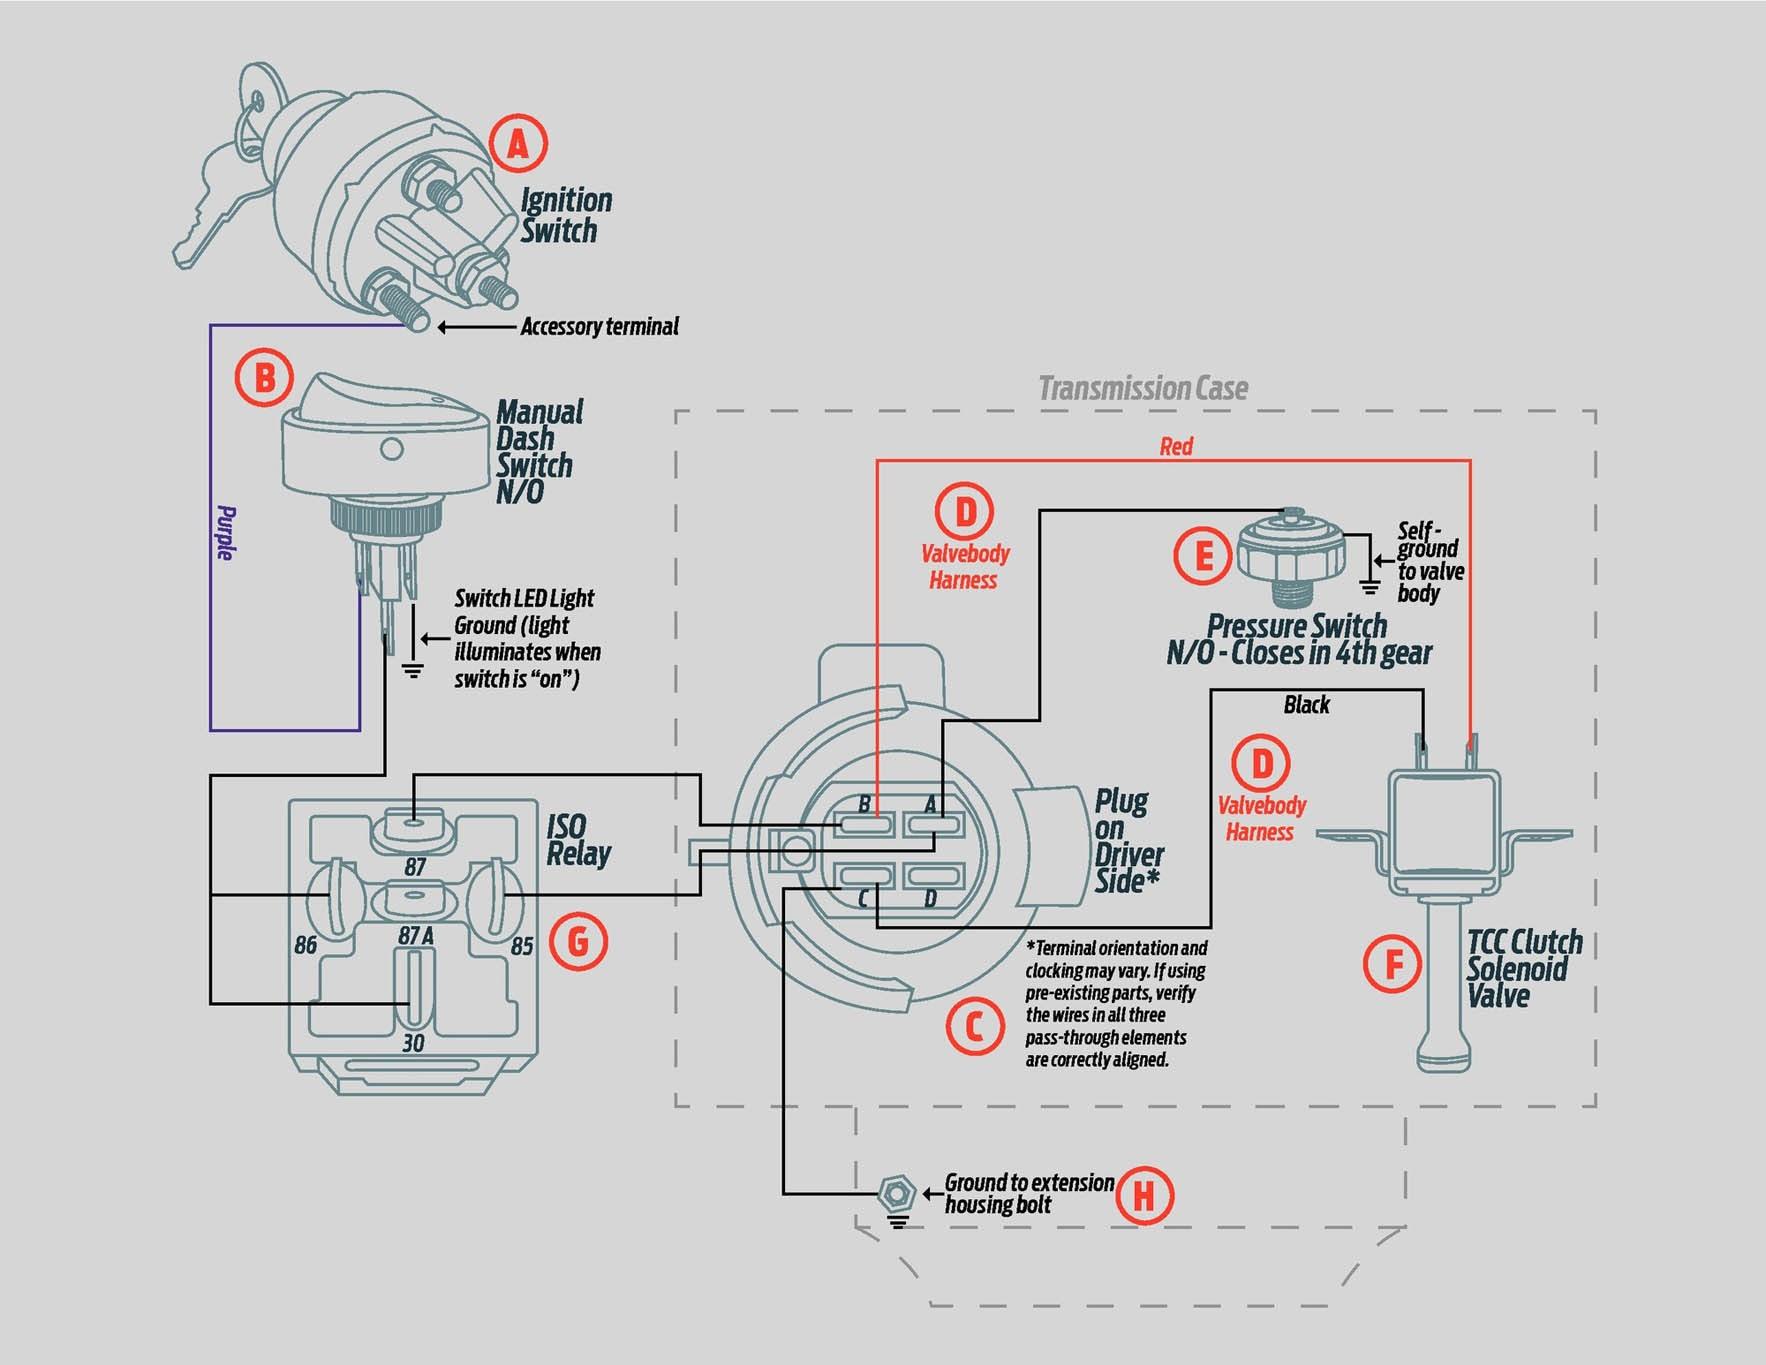 Diagram In Pictures Database 1993 700r4 Wiring Diagram Just Download Or Read Wiring Diagram Online Casalamm Edu Mx